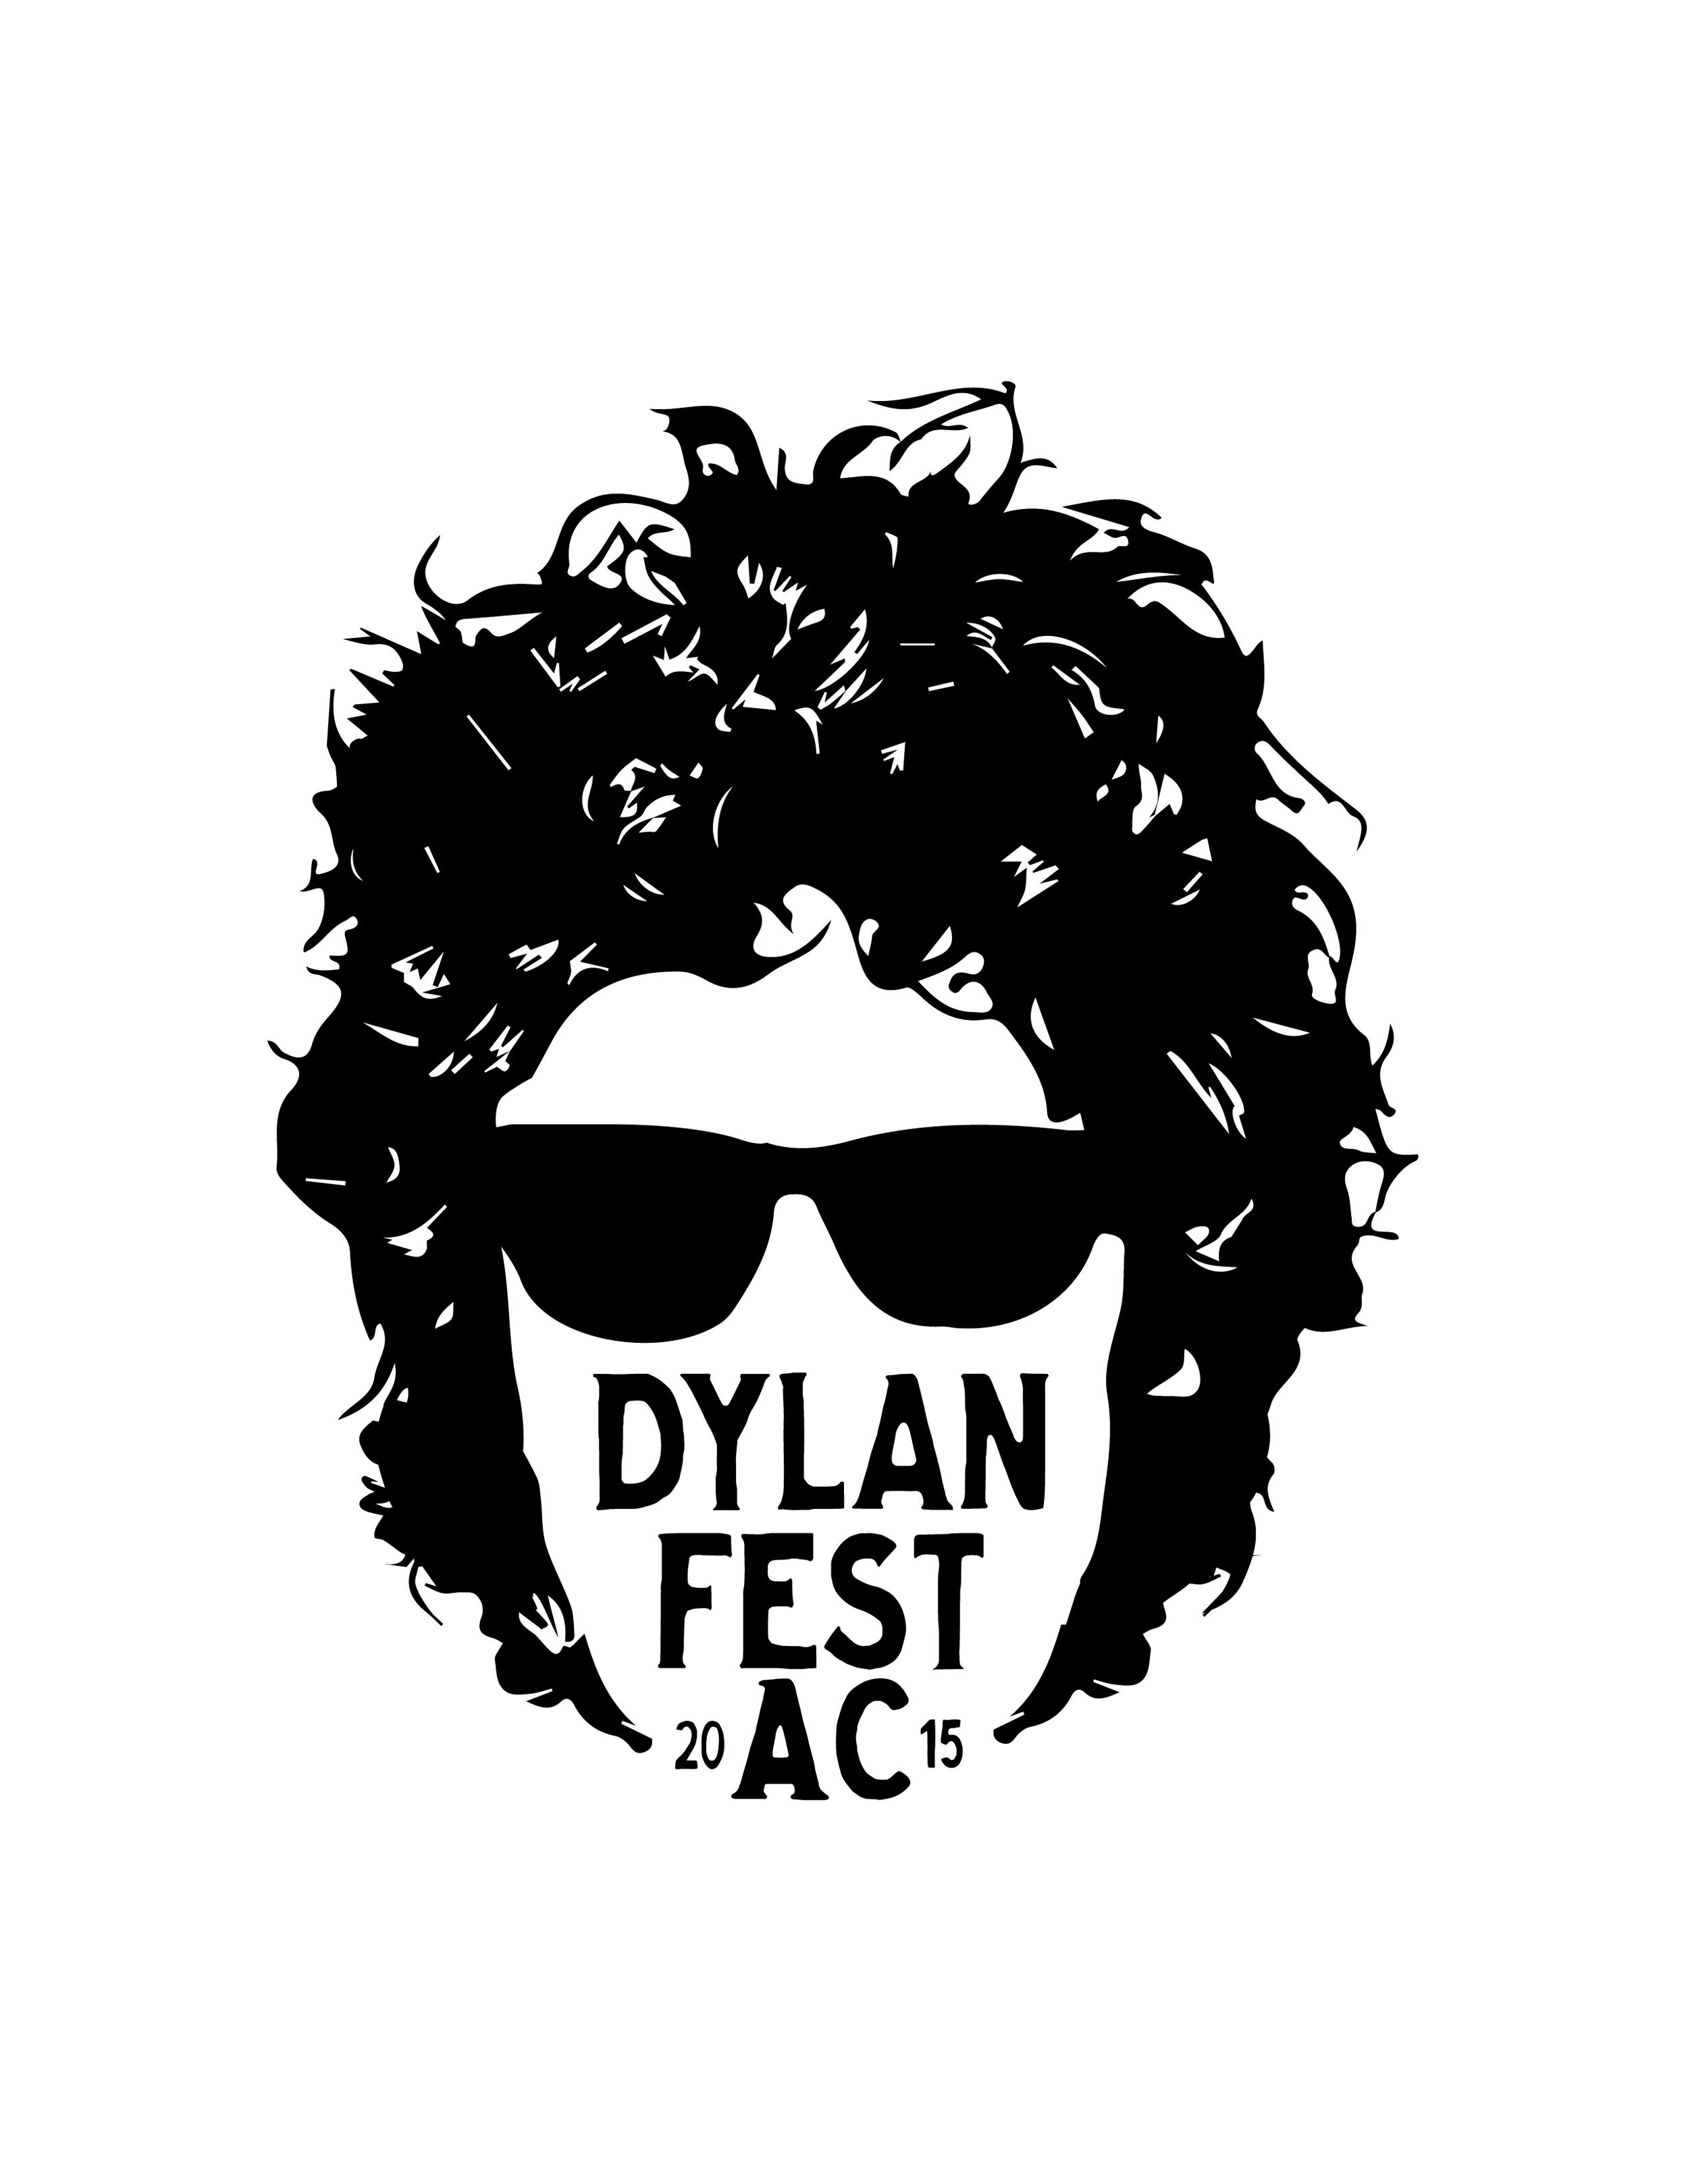 Dylan Fest AC logo2_flat-01_HIGHRES.jpg